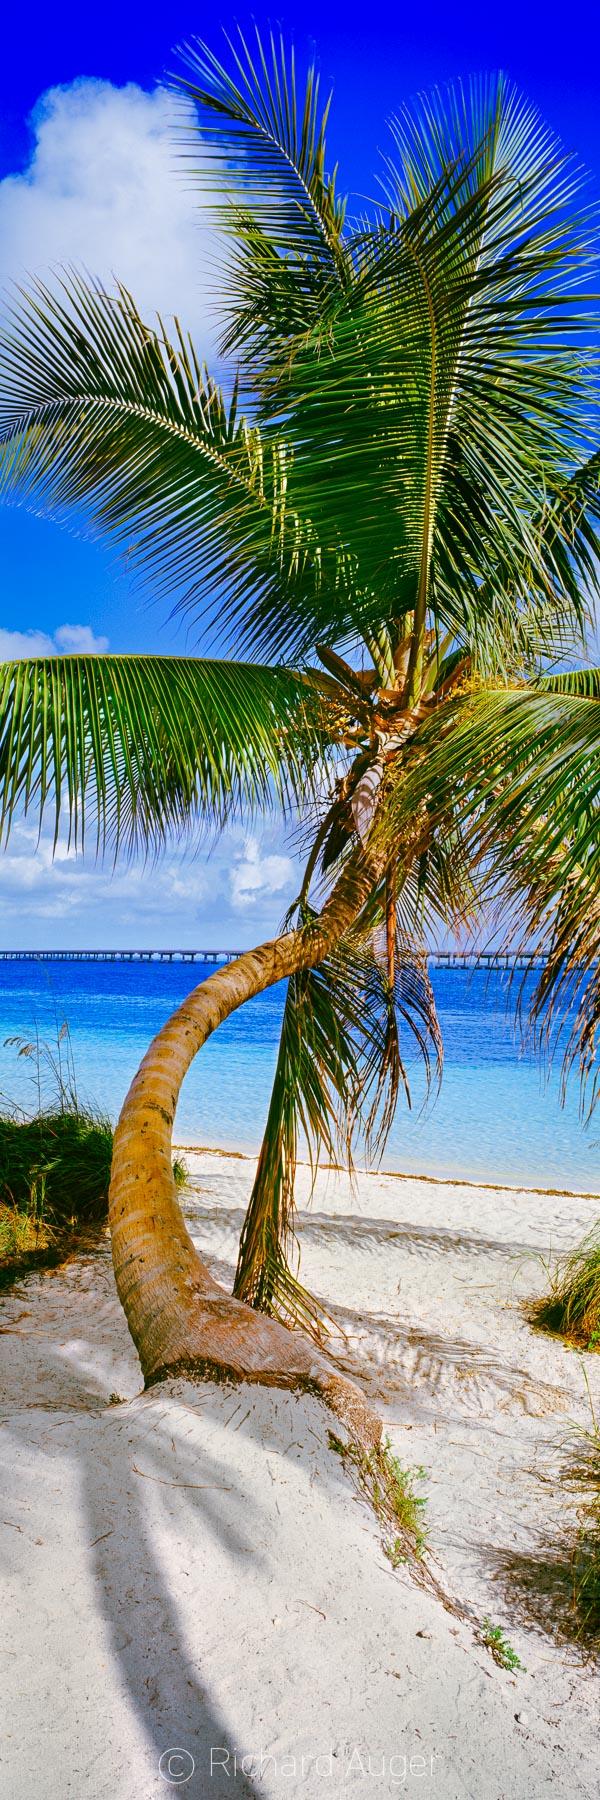 Bahia Honda State Park, Florida Keys, Palm Tree, Sunny, Vertical Panorama, Beach, Tropical, Photography